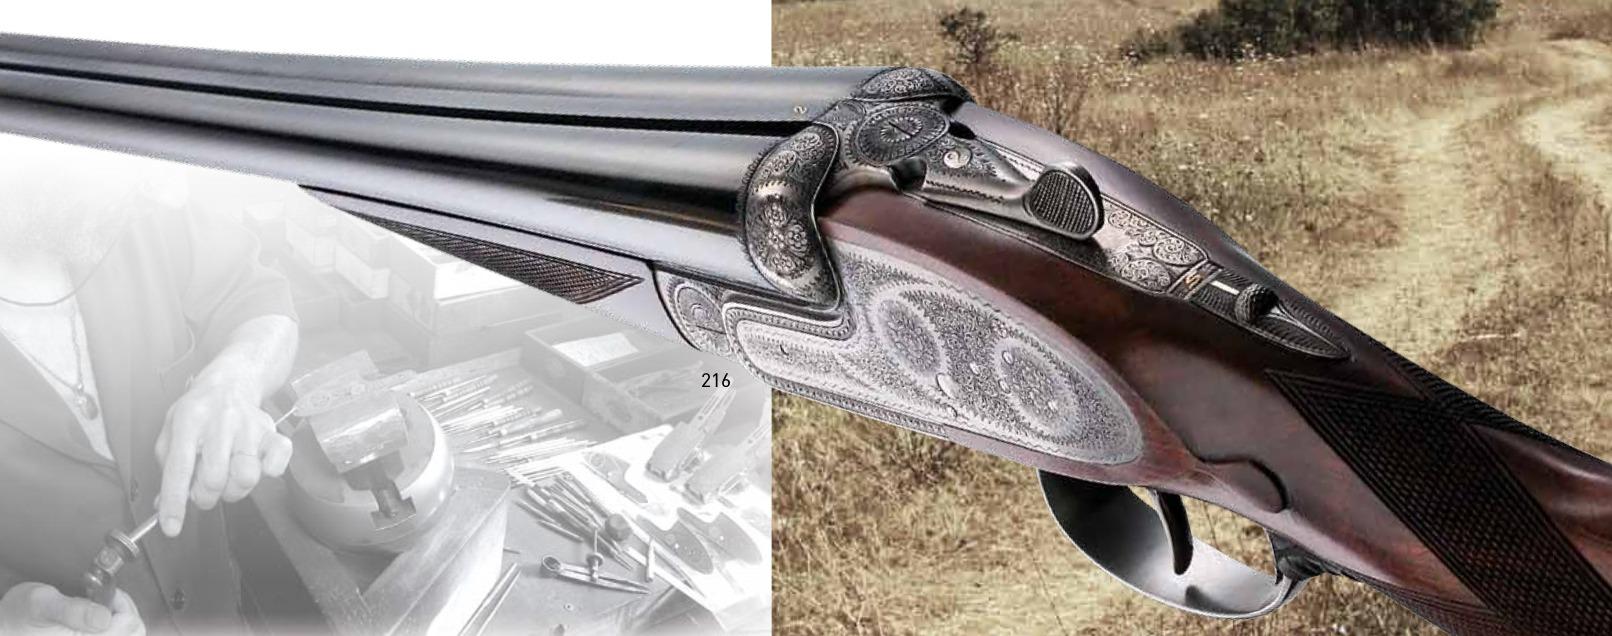 Grulla Armas side by side sidelock ejector shotgun